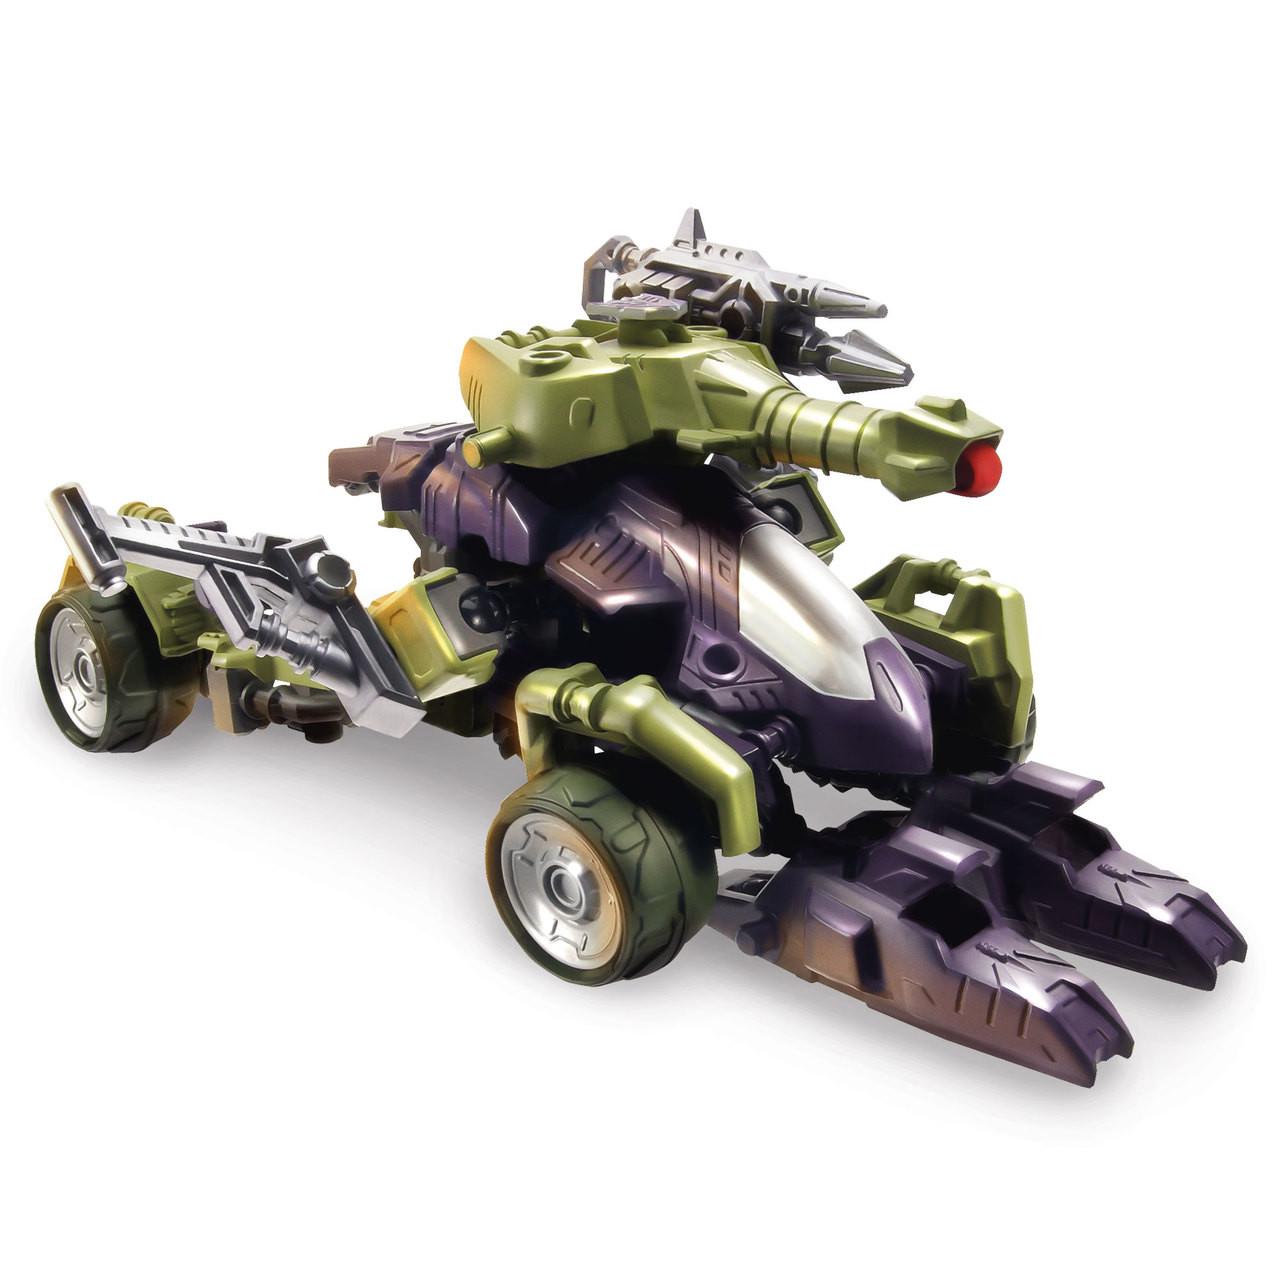 Transformers Construct-Bots Triple Changers Blitzwing Buildable Action Figure